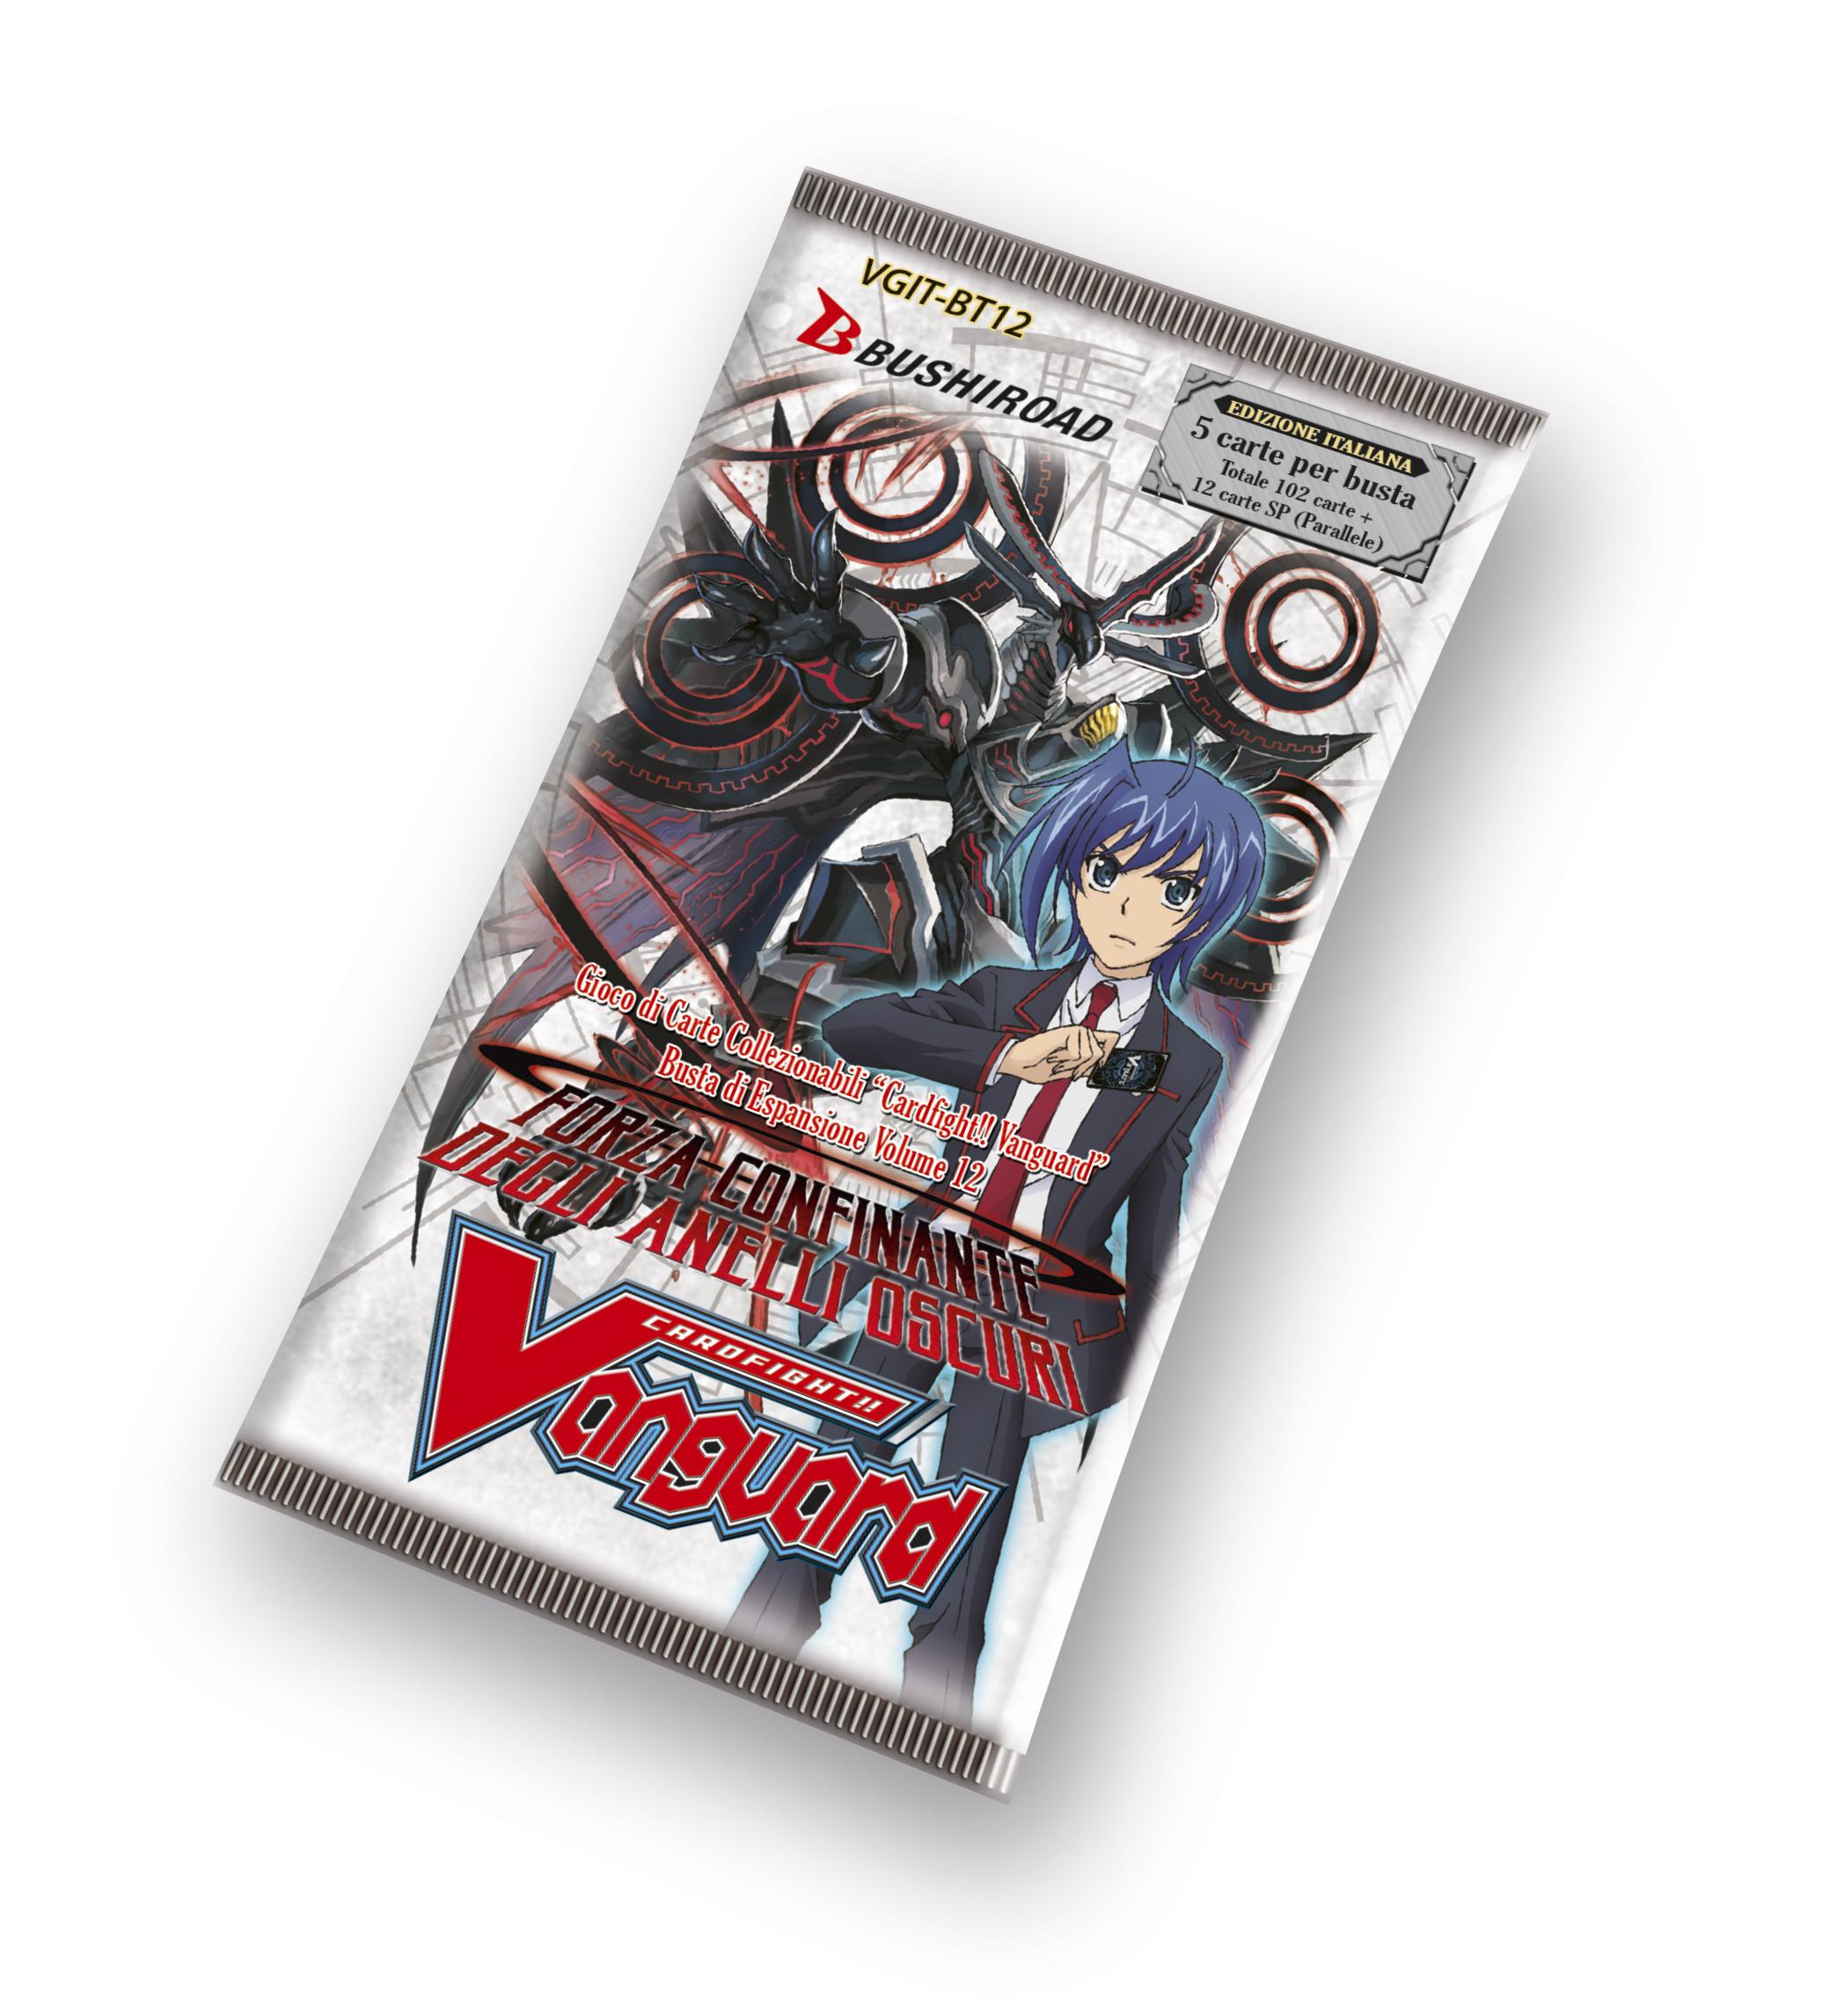 OLTRE I LIMITI box da 30 buste Vanguard Set 06 Cardfight!